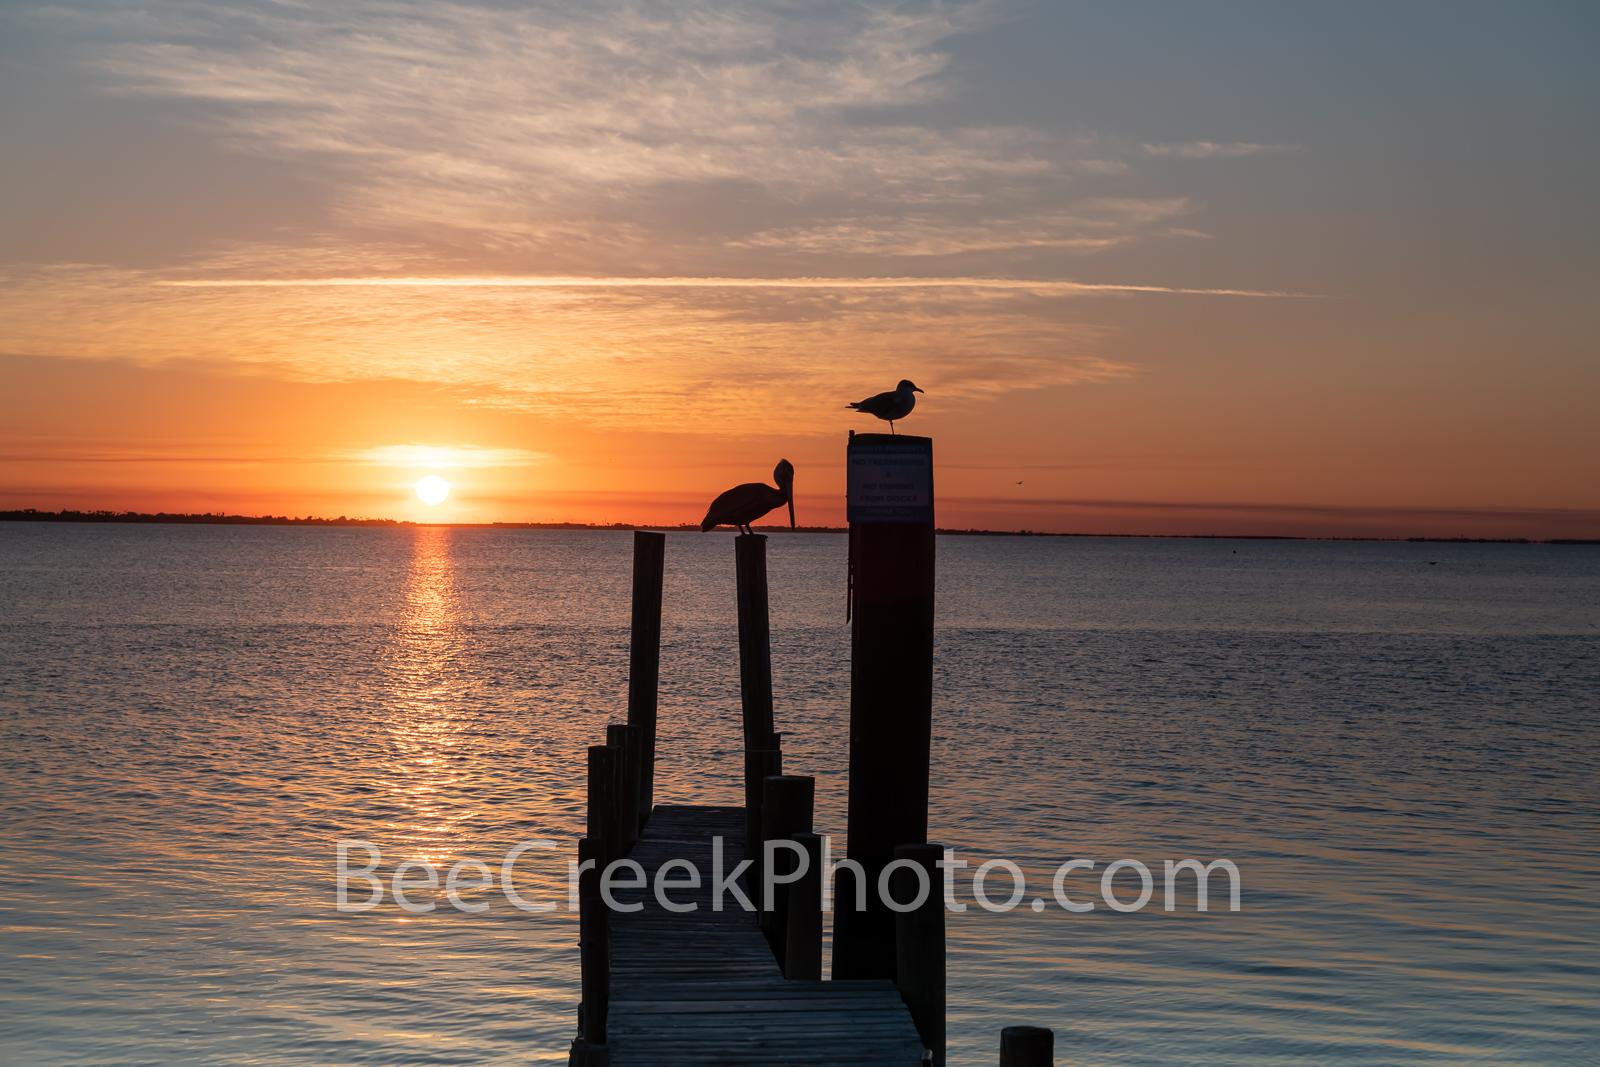 Island Sunset, birds, island, sunset, laquna madre, south padre island, seascape, coast, silouette, pelican, seagull, dock, roosting, scenic, seascape, coastal,, photo